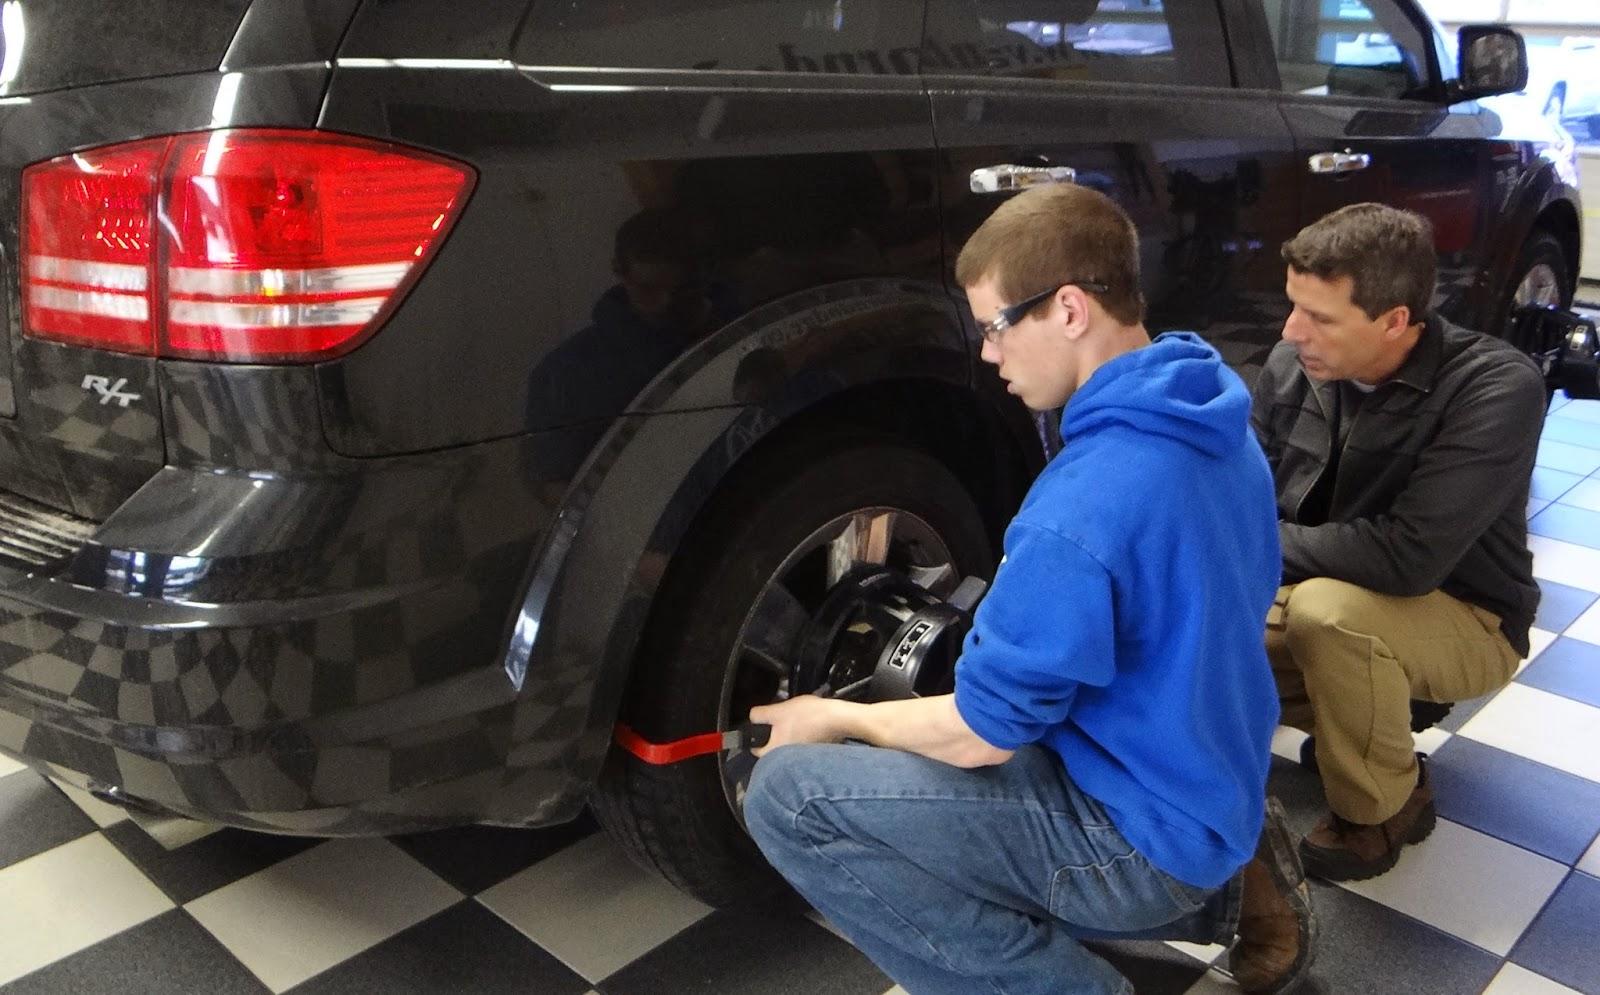 Sheboygan County Budget Auto >> Van Horn Auto Group Blog: Van Horn Automotive Hosts Plymouth High School Auto Shop Class